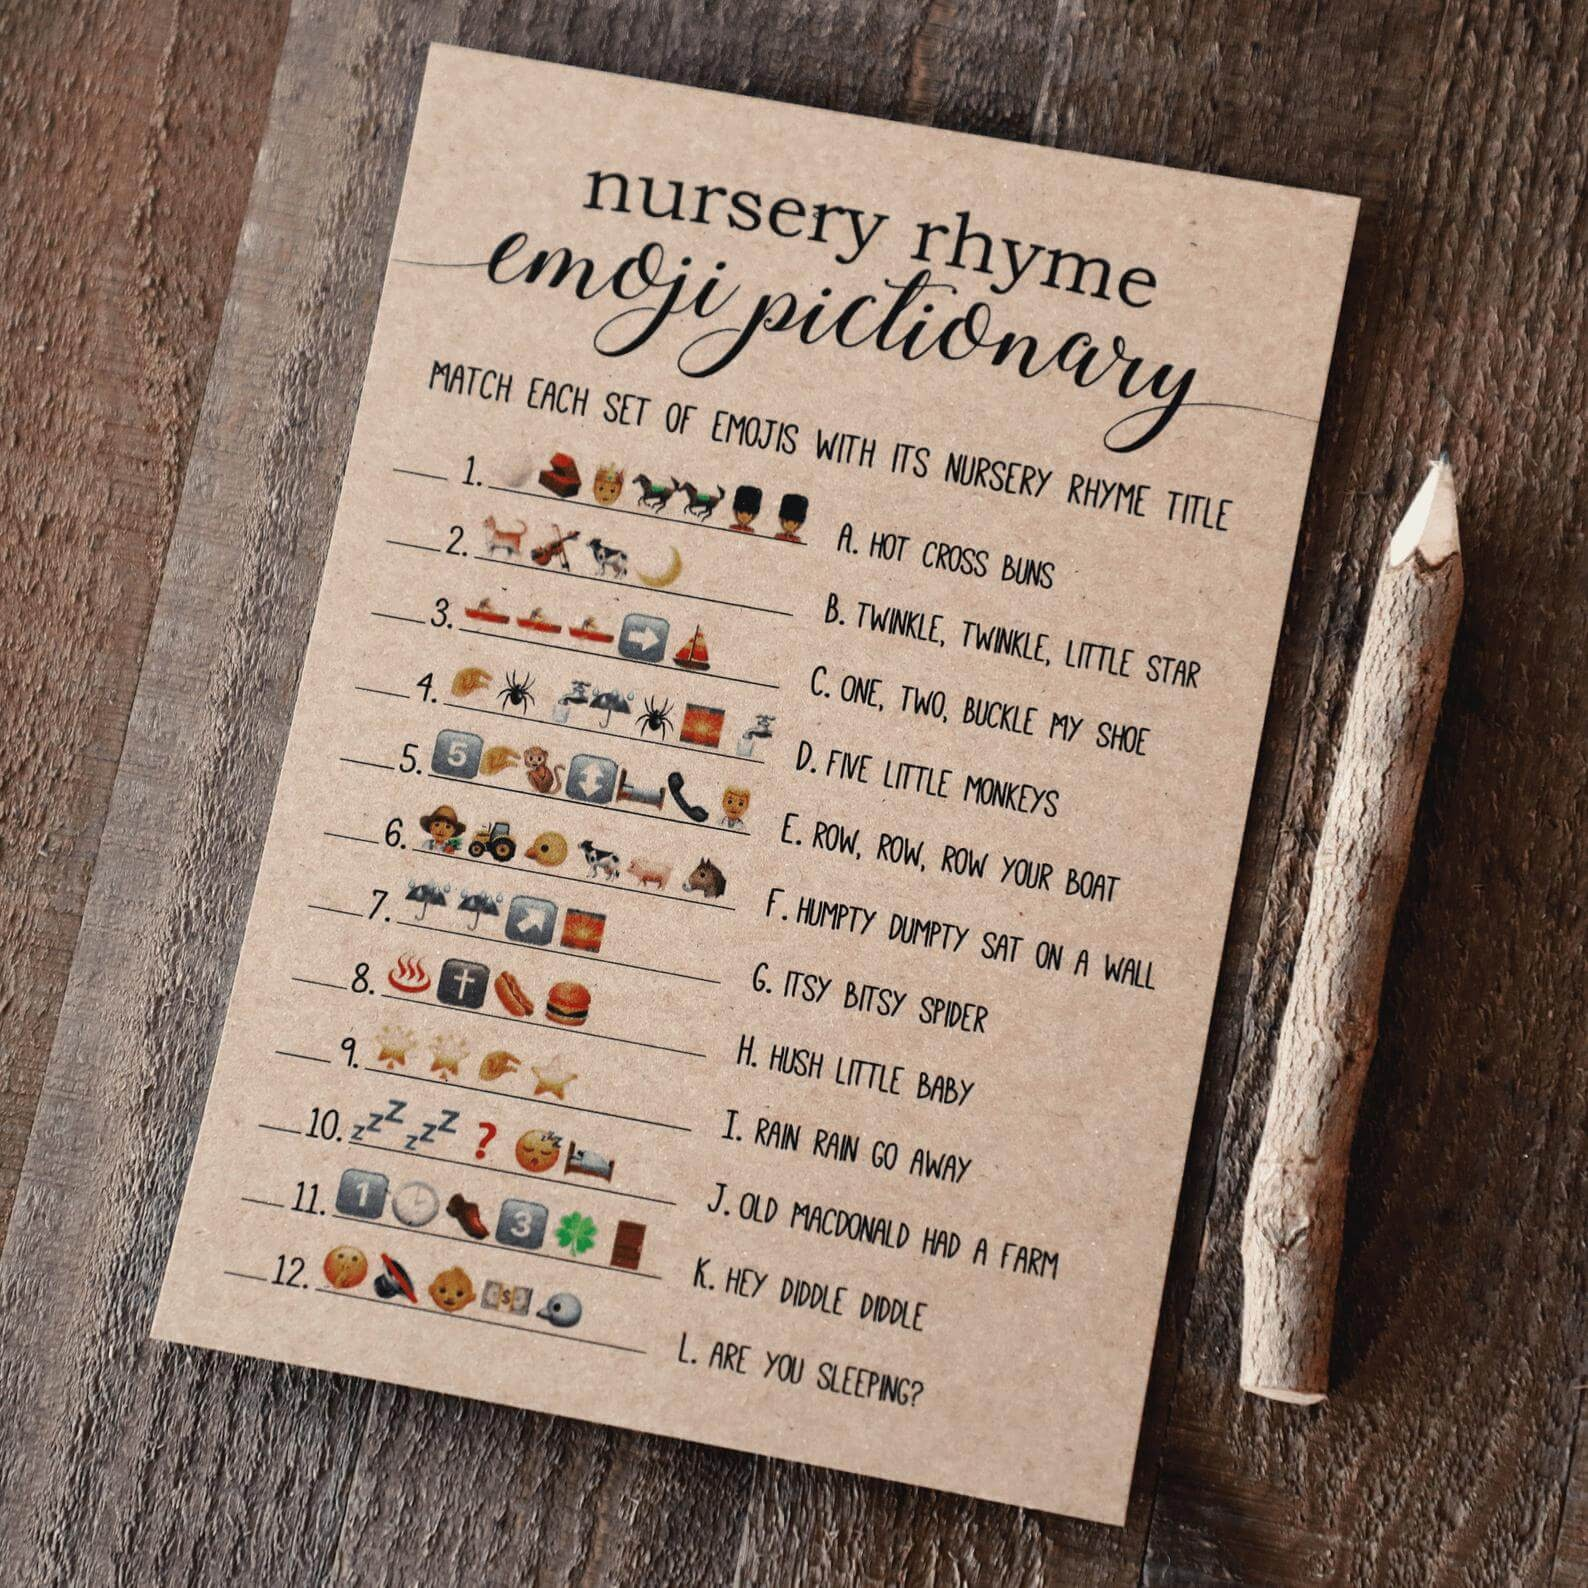 Nursery Rhyme Emoji Pictionary